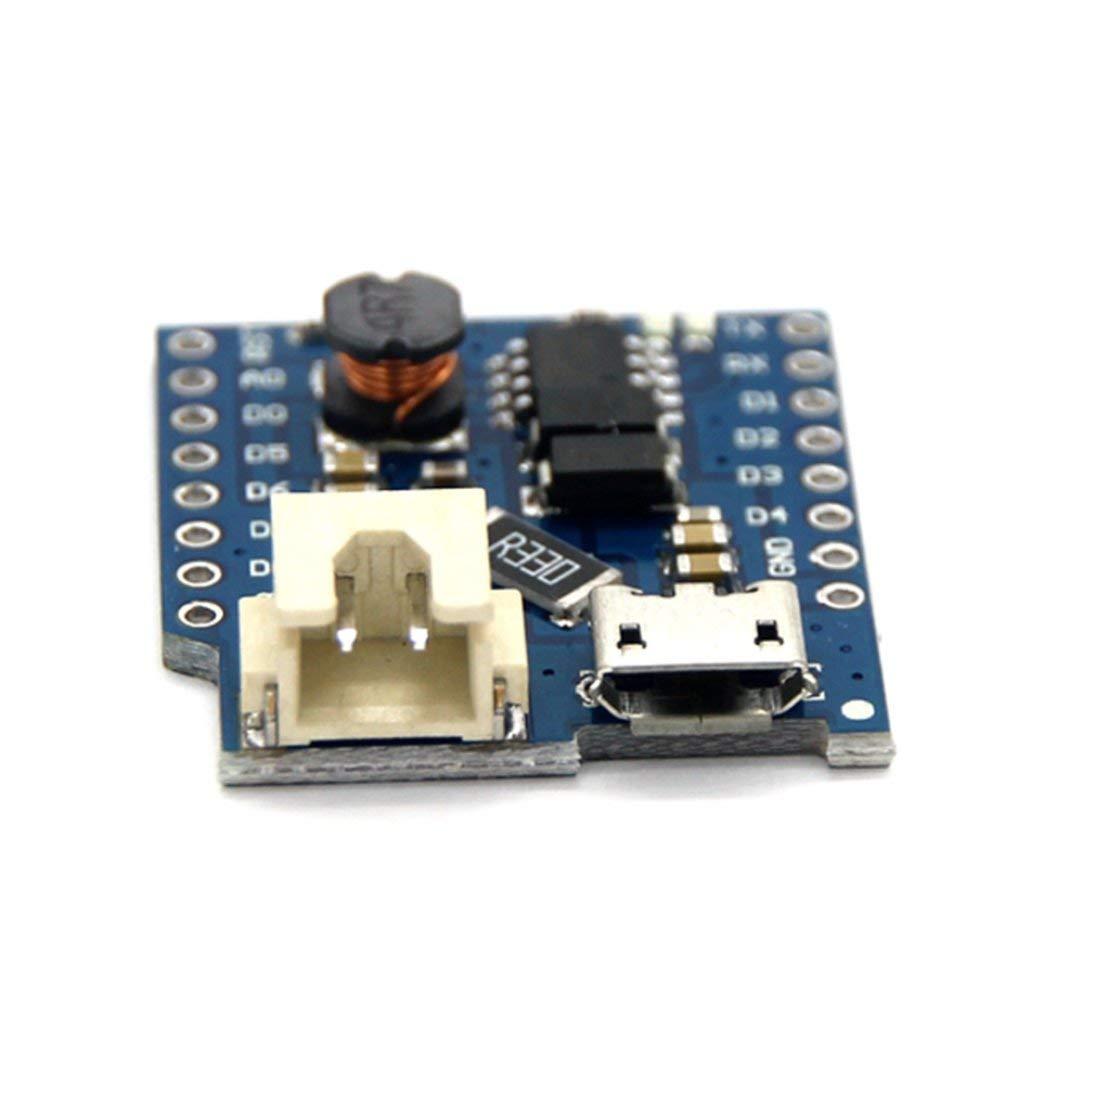 HiLetgo 3pcs WeMos D1 mini Single Lithium Battery Charging Board D1 Lithium Boost Shield